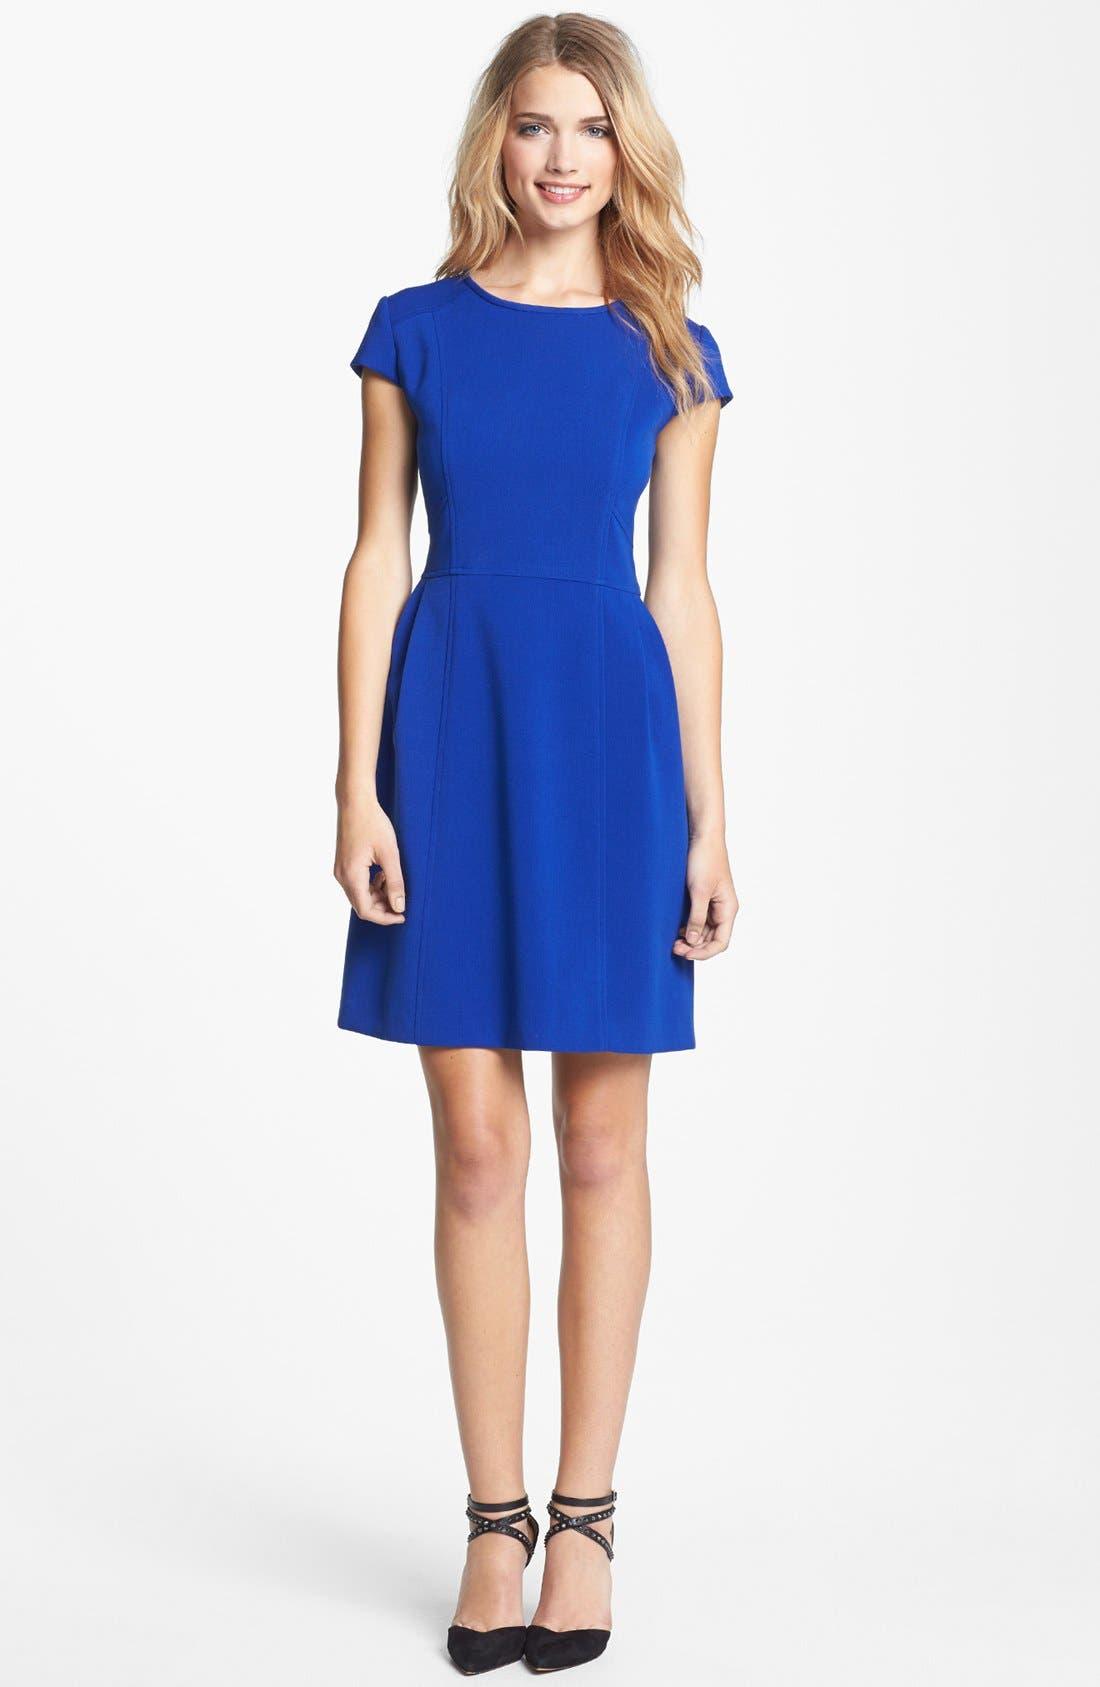 Alternate Image 1 Selected - Eliza J Seamed Double Knit Crepe Fit & Flare Dress (Regular & Petite)